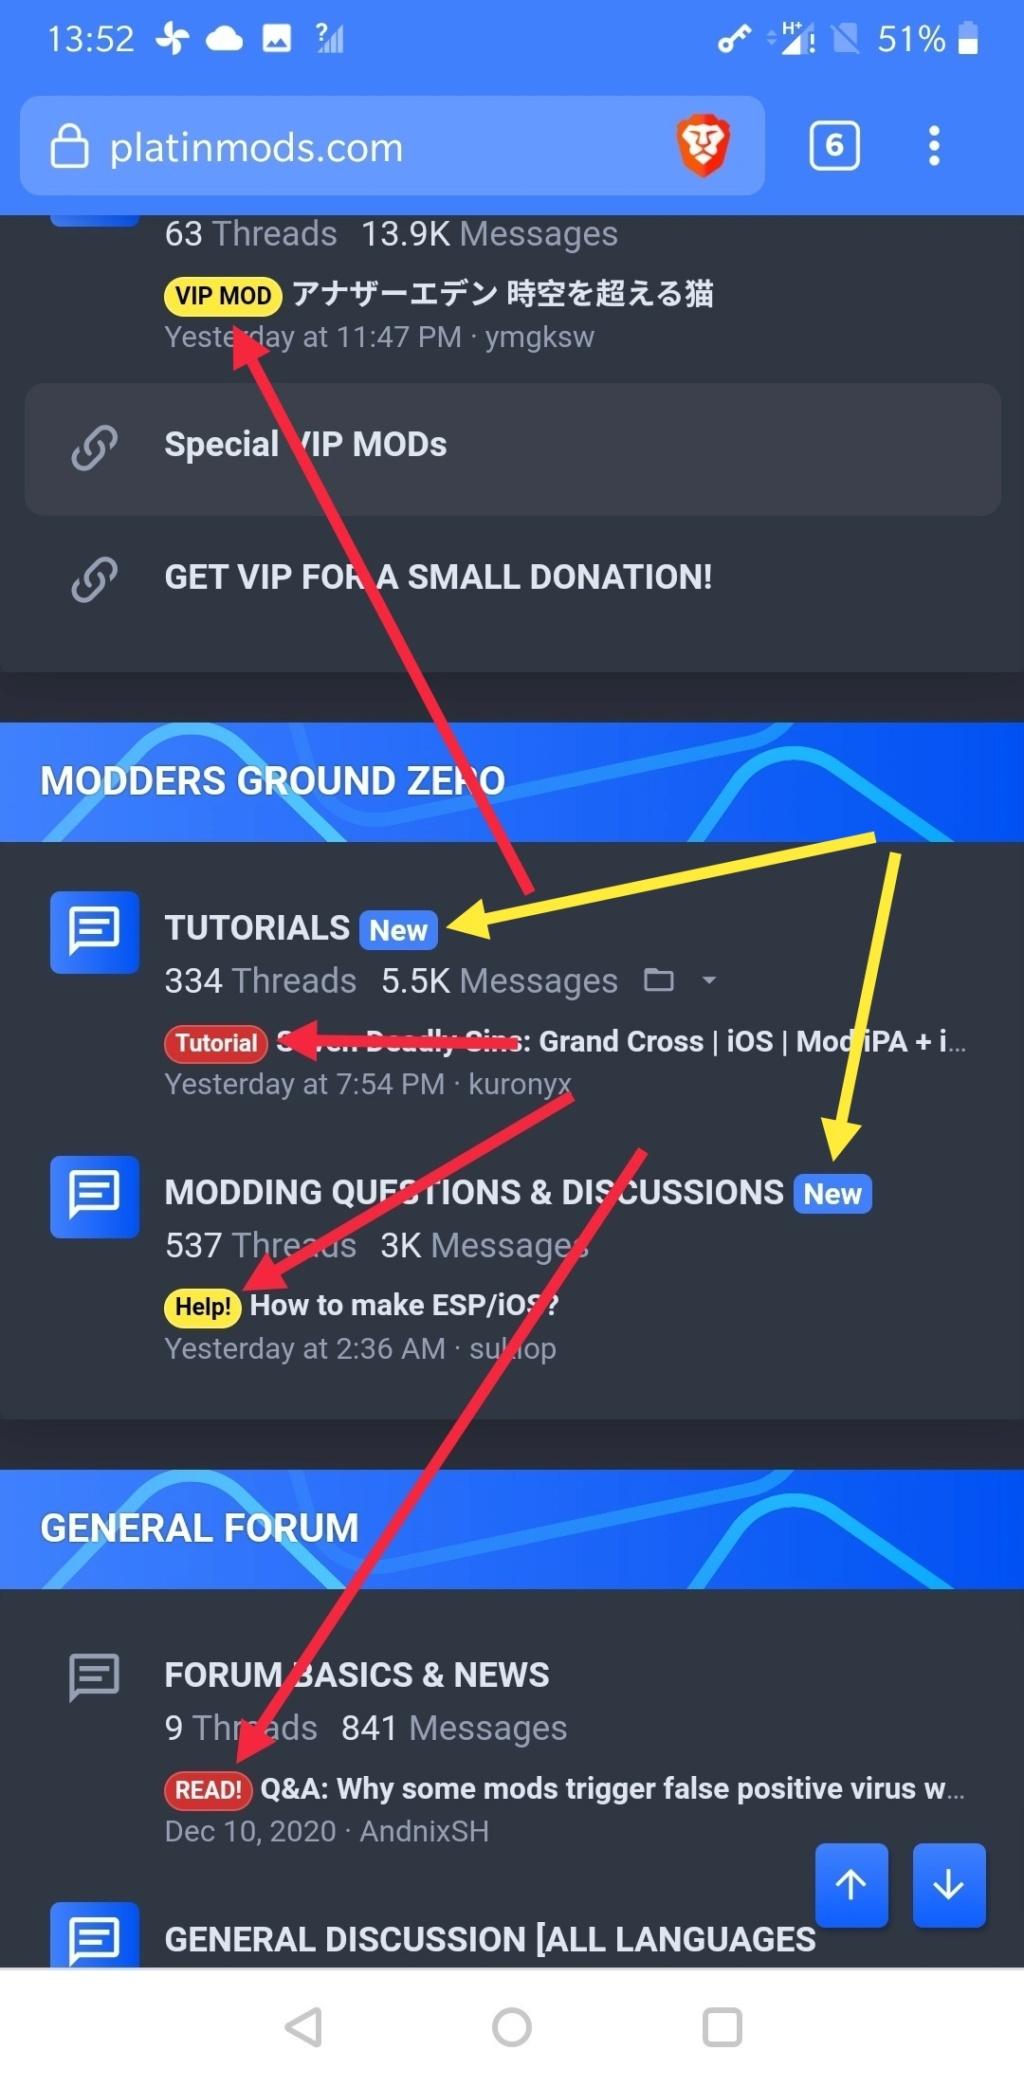 Adicionar etiquetas (tags) aos tópicos Screen11